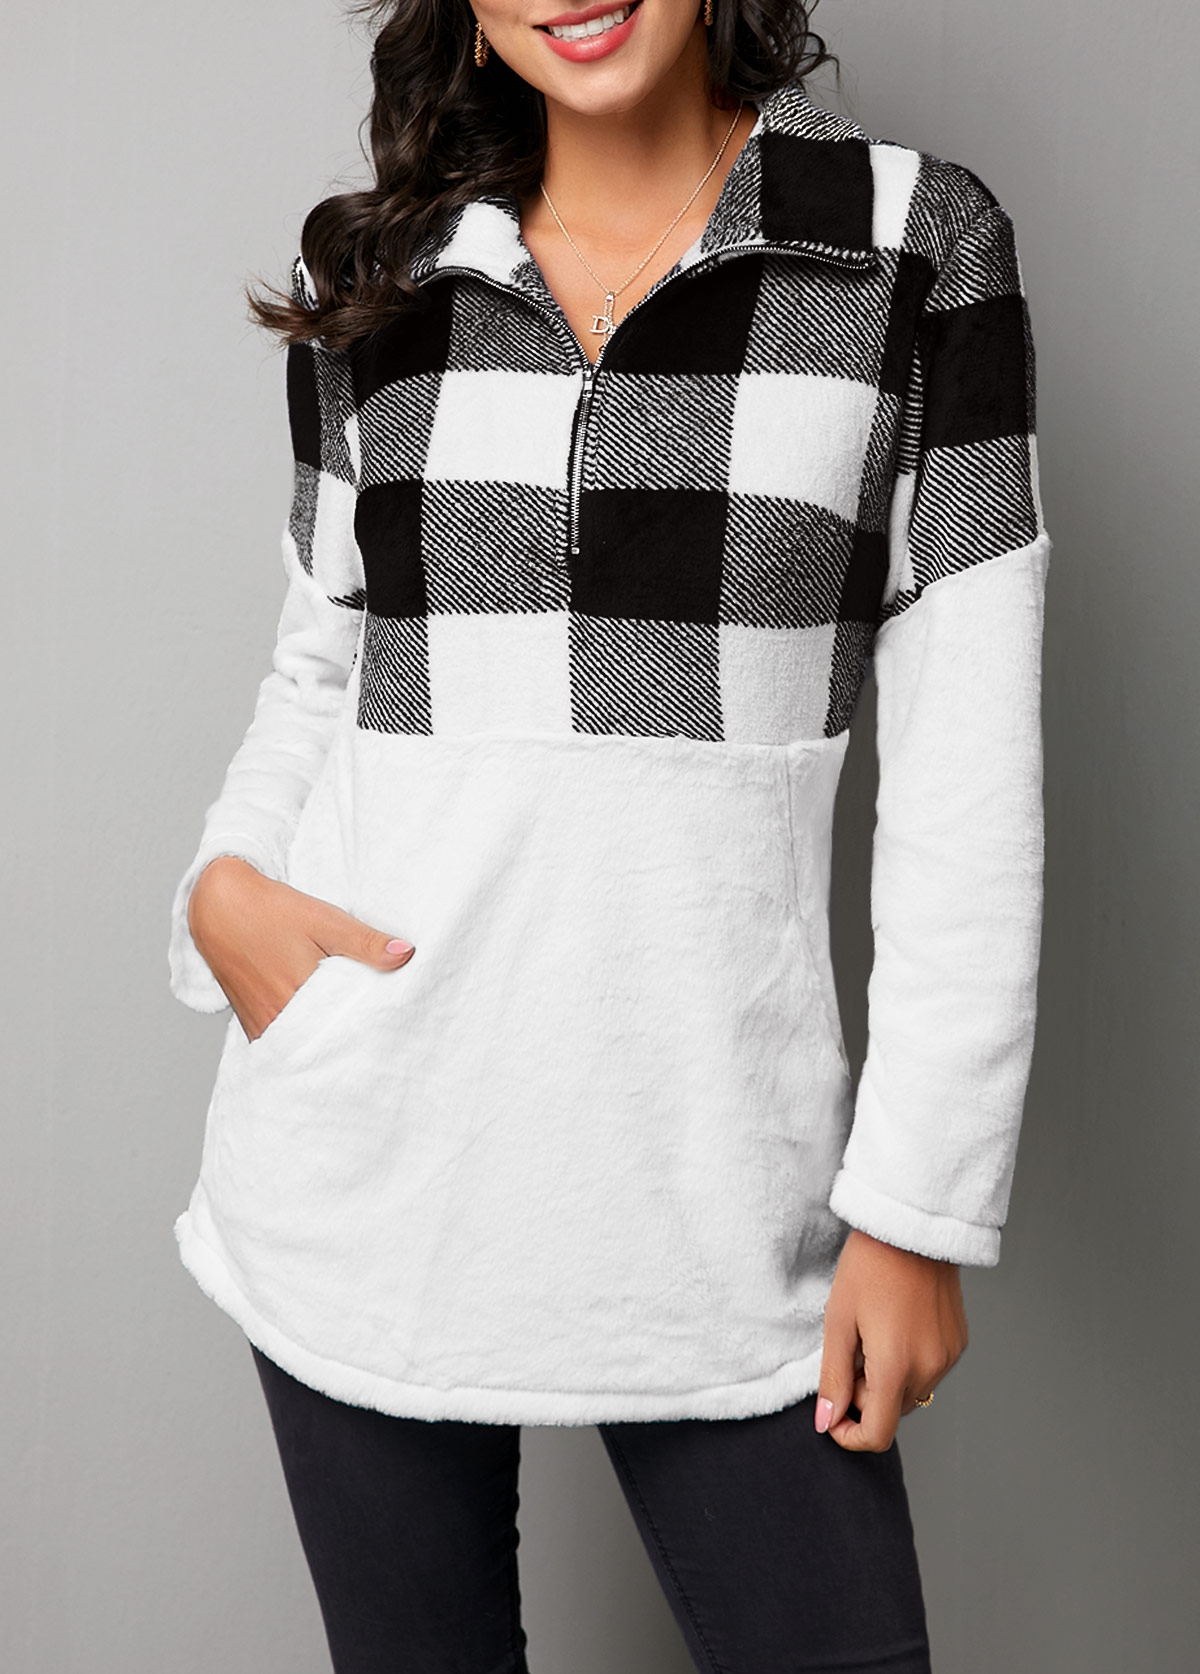 ROTITA Plaid Patchwork Turndown Collar Long Sleeve Sweatshirt